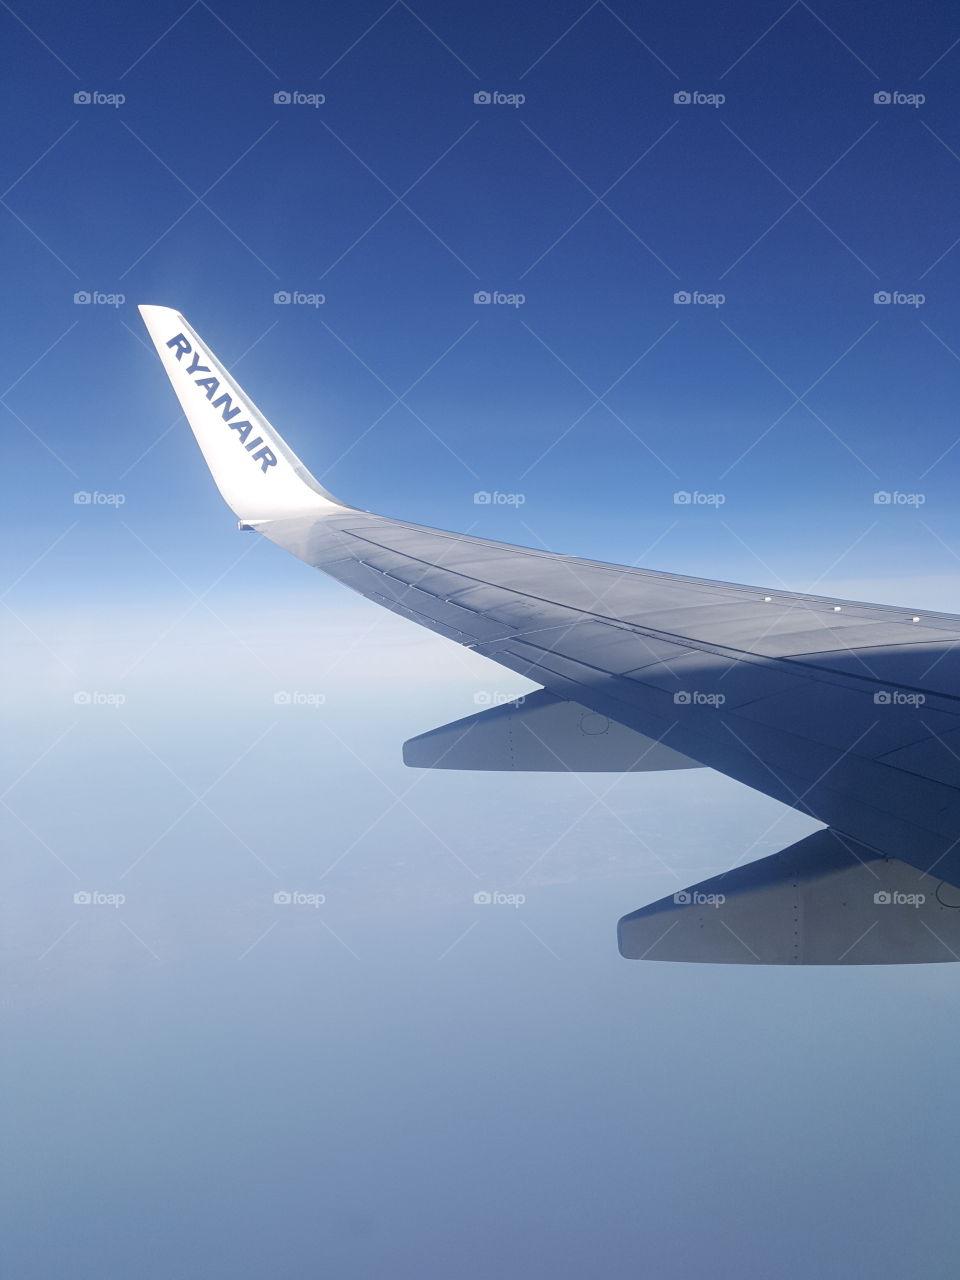 Ryanair flight wing of plane